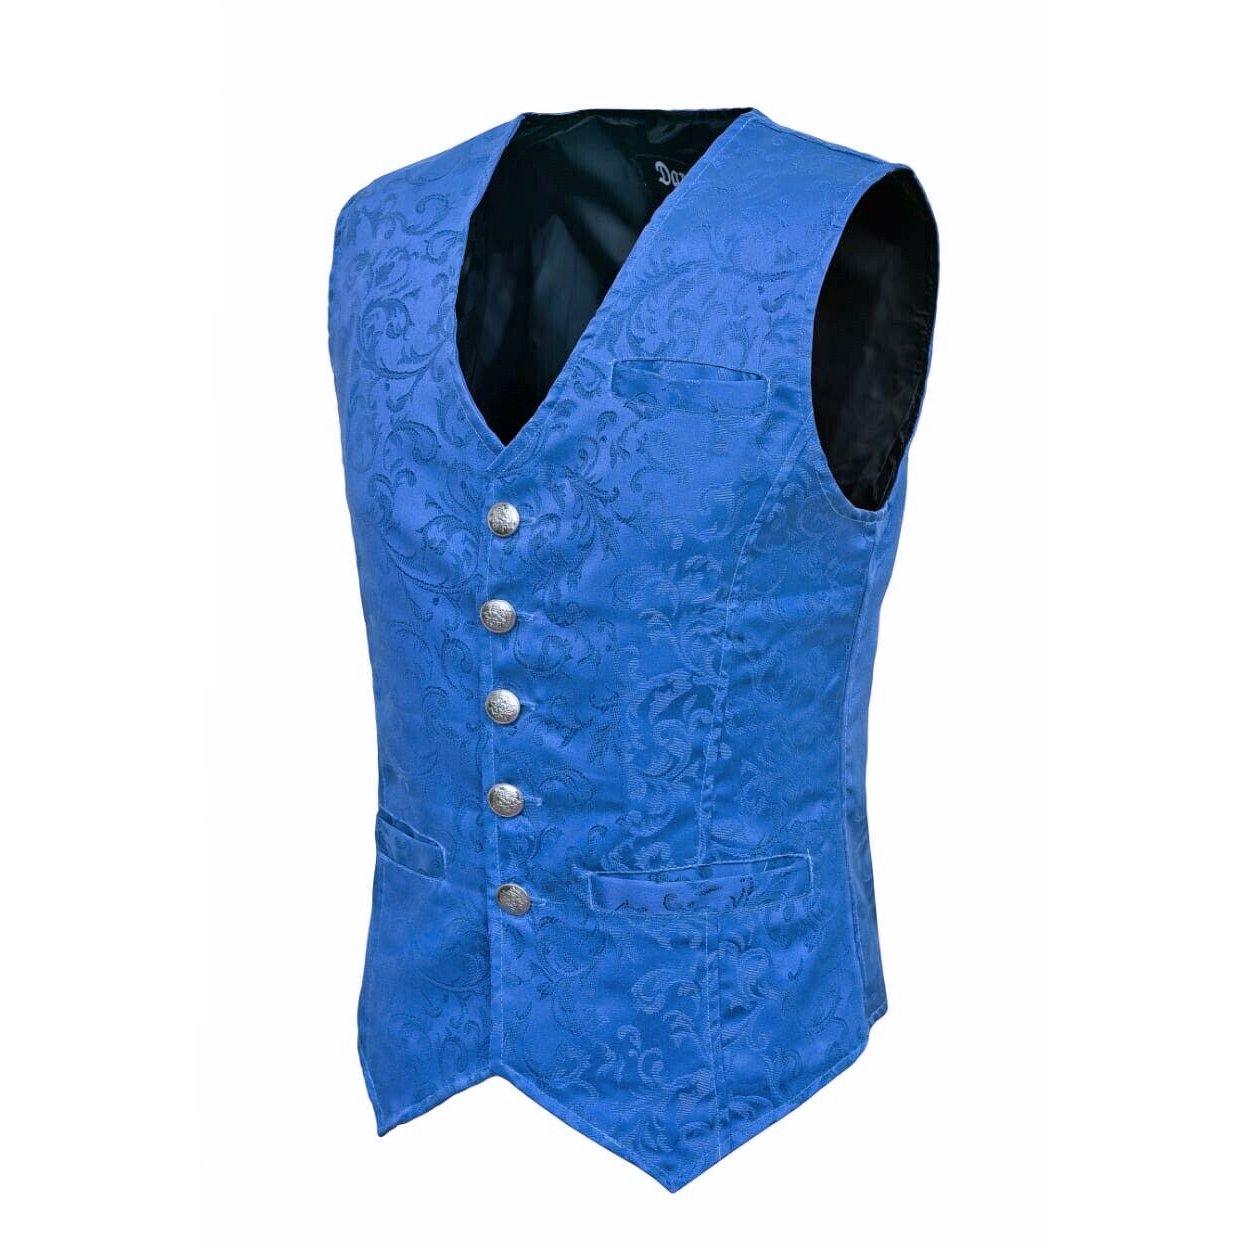 DARKROCK Waistcoat Gothic Steampunk Royal Blue Vest(side)